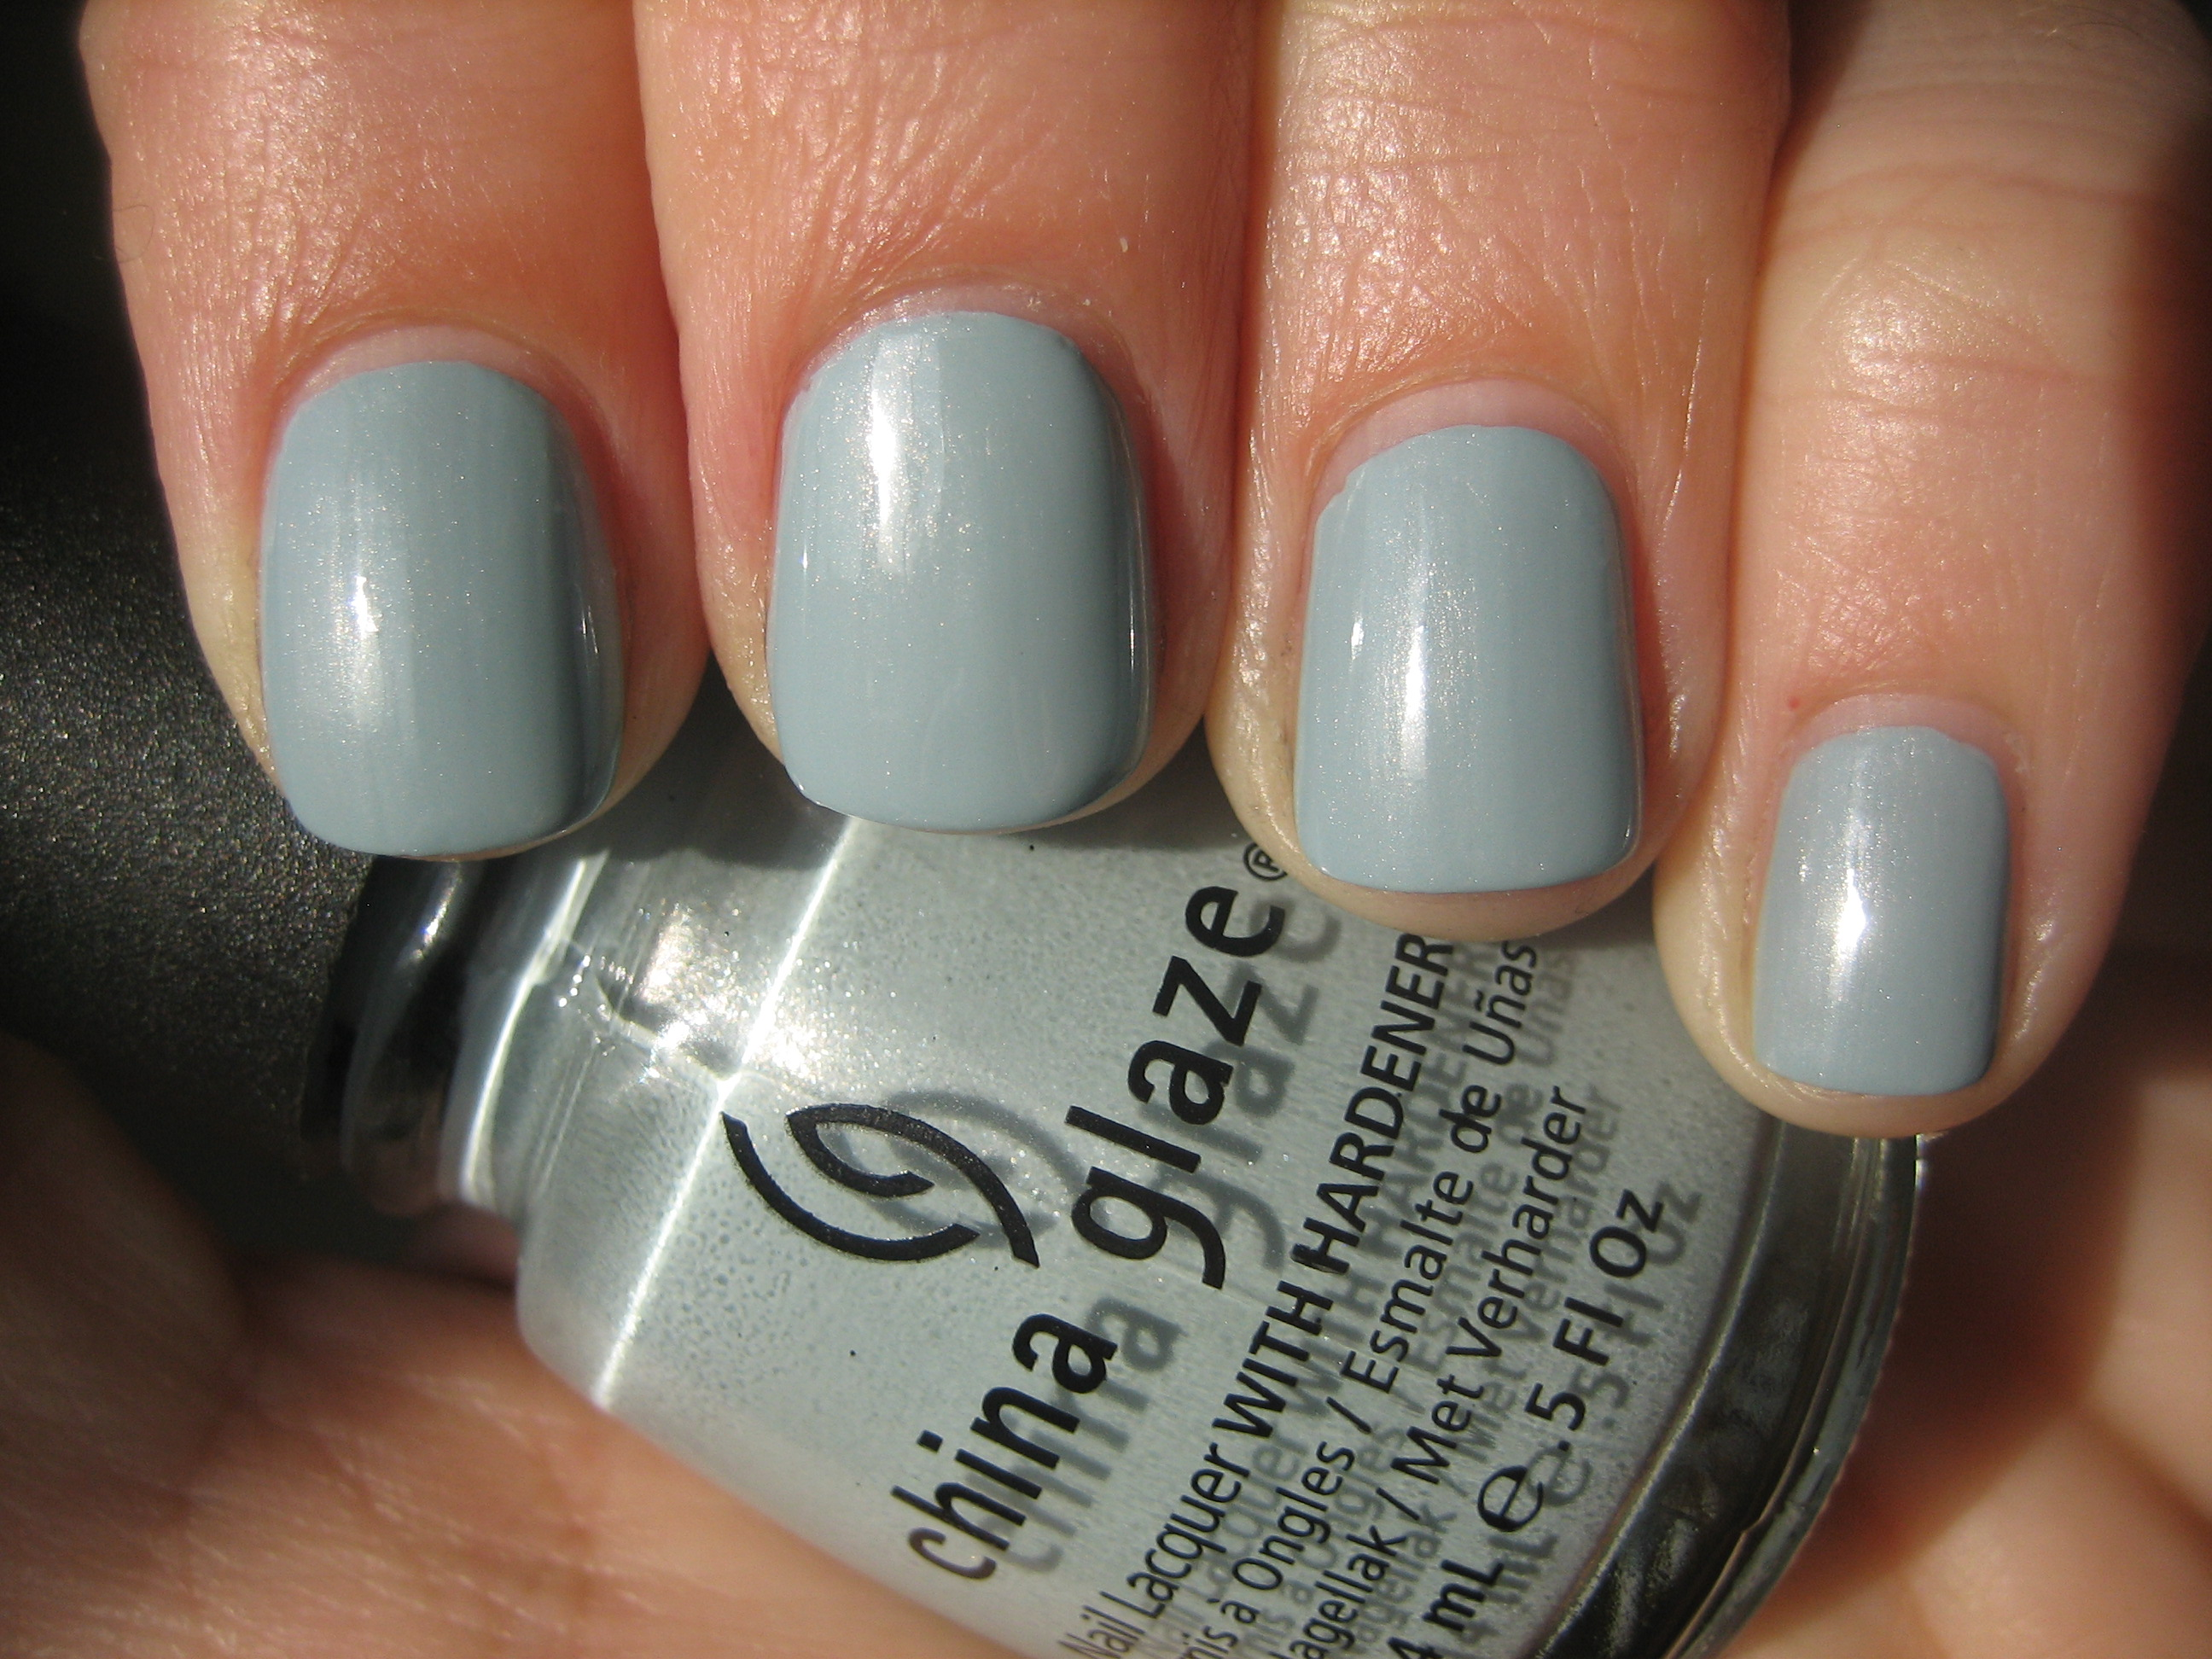 Spray on nail polish china glaze nail spray reviews - The